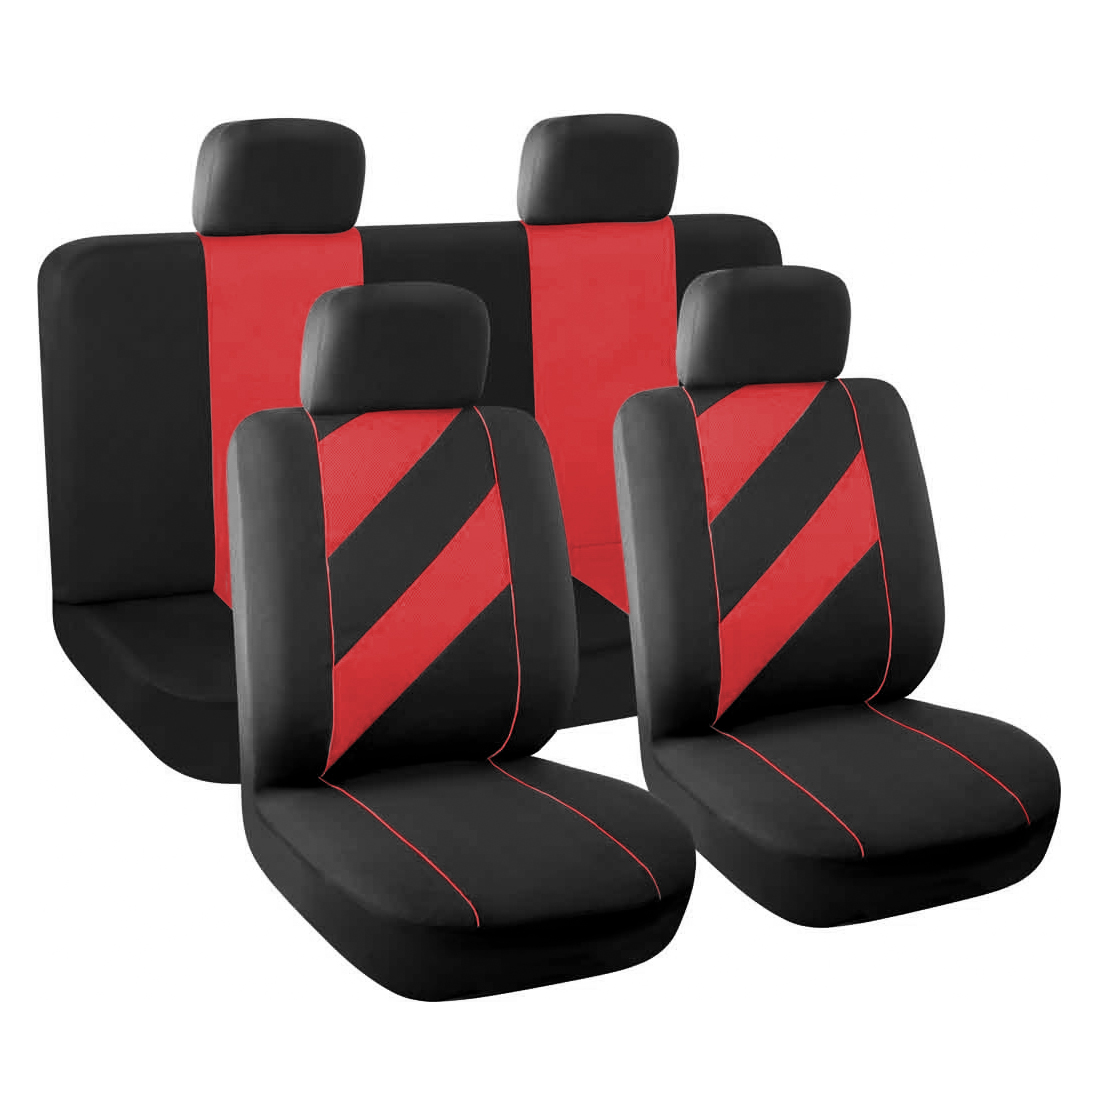 8 Piece Unique Flat Cloth Auto Car Seat Cover Headrests Full set Red